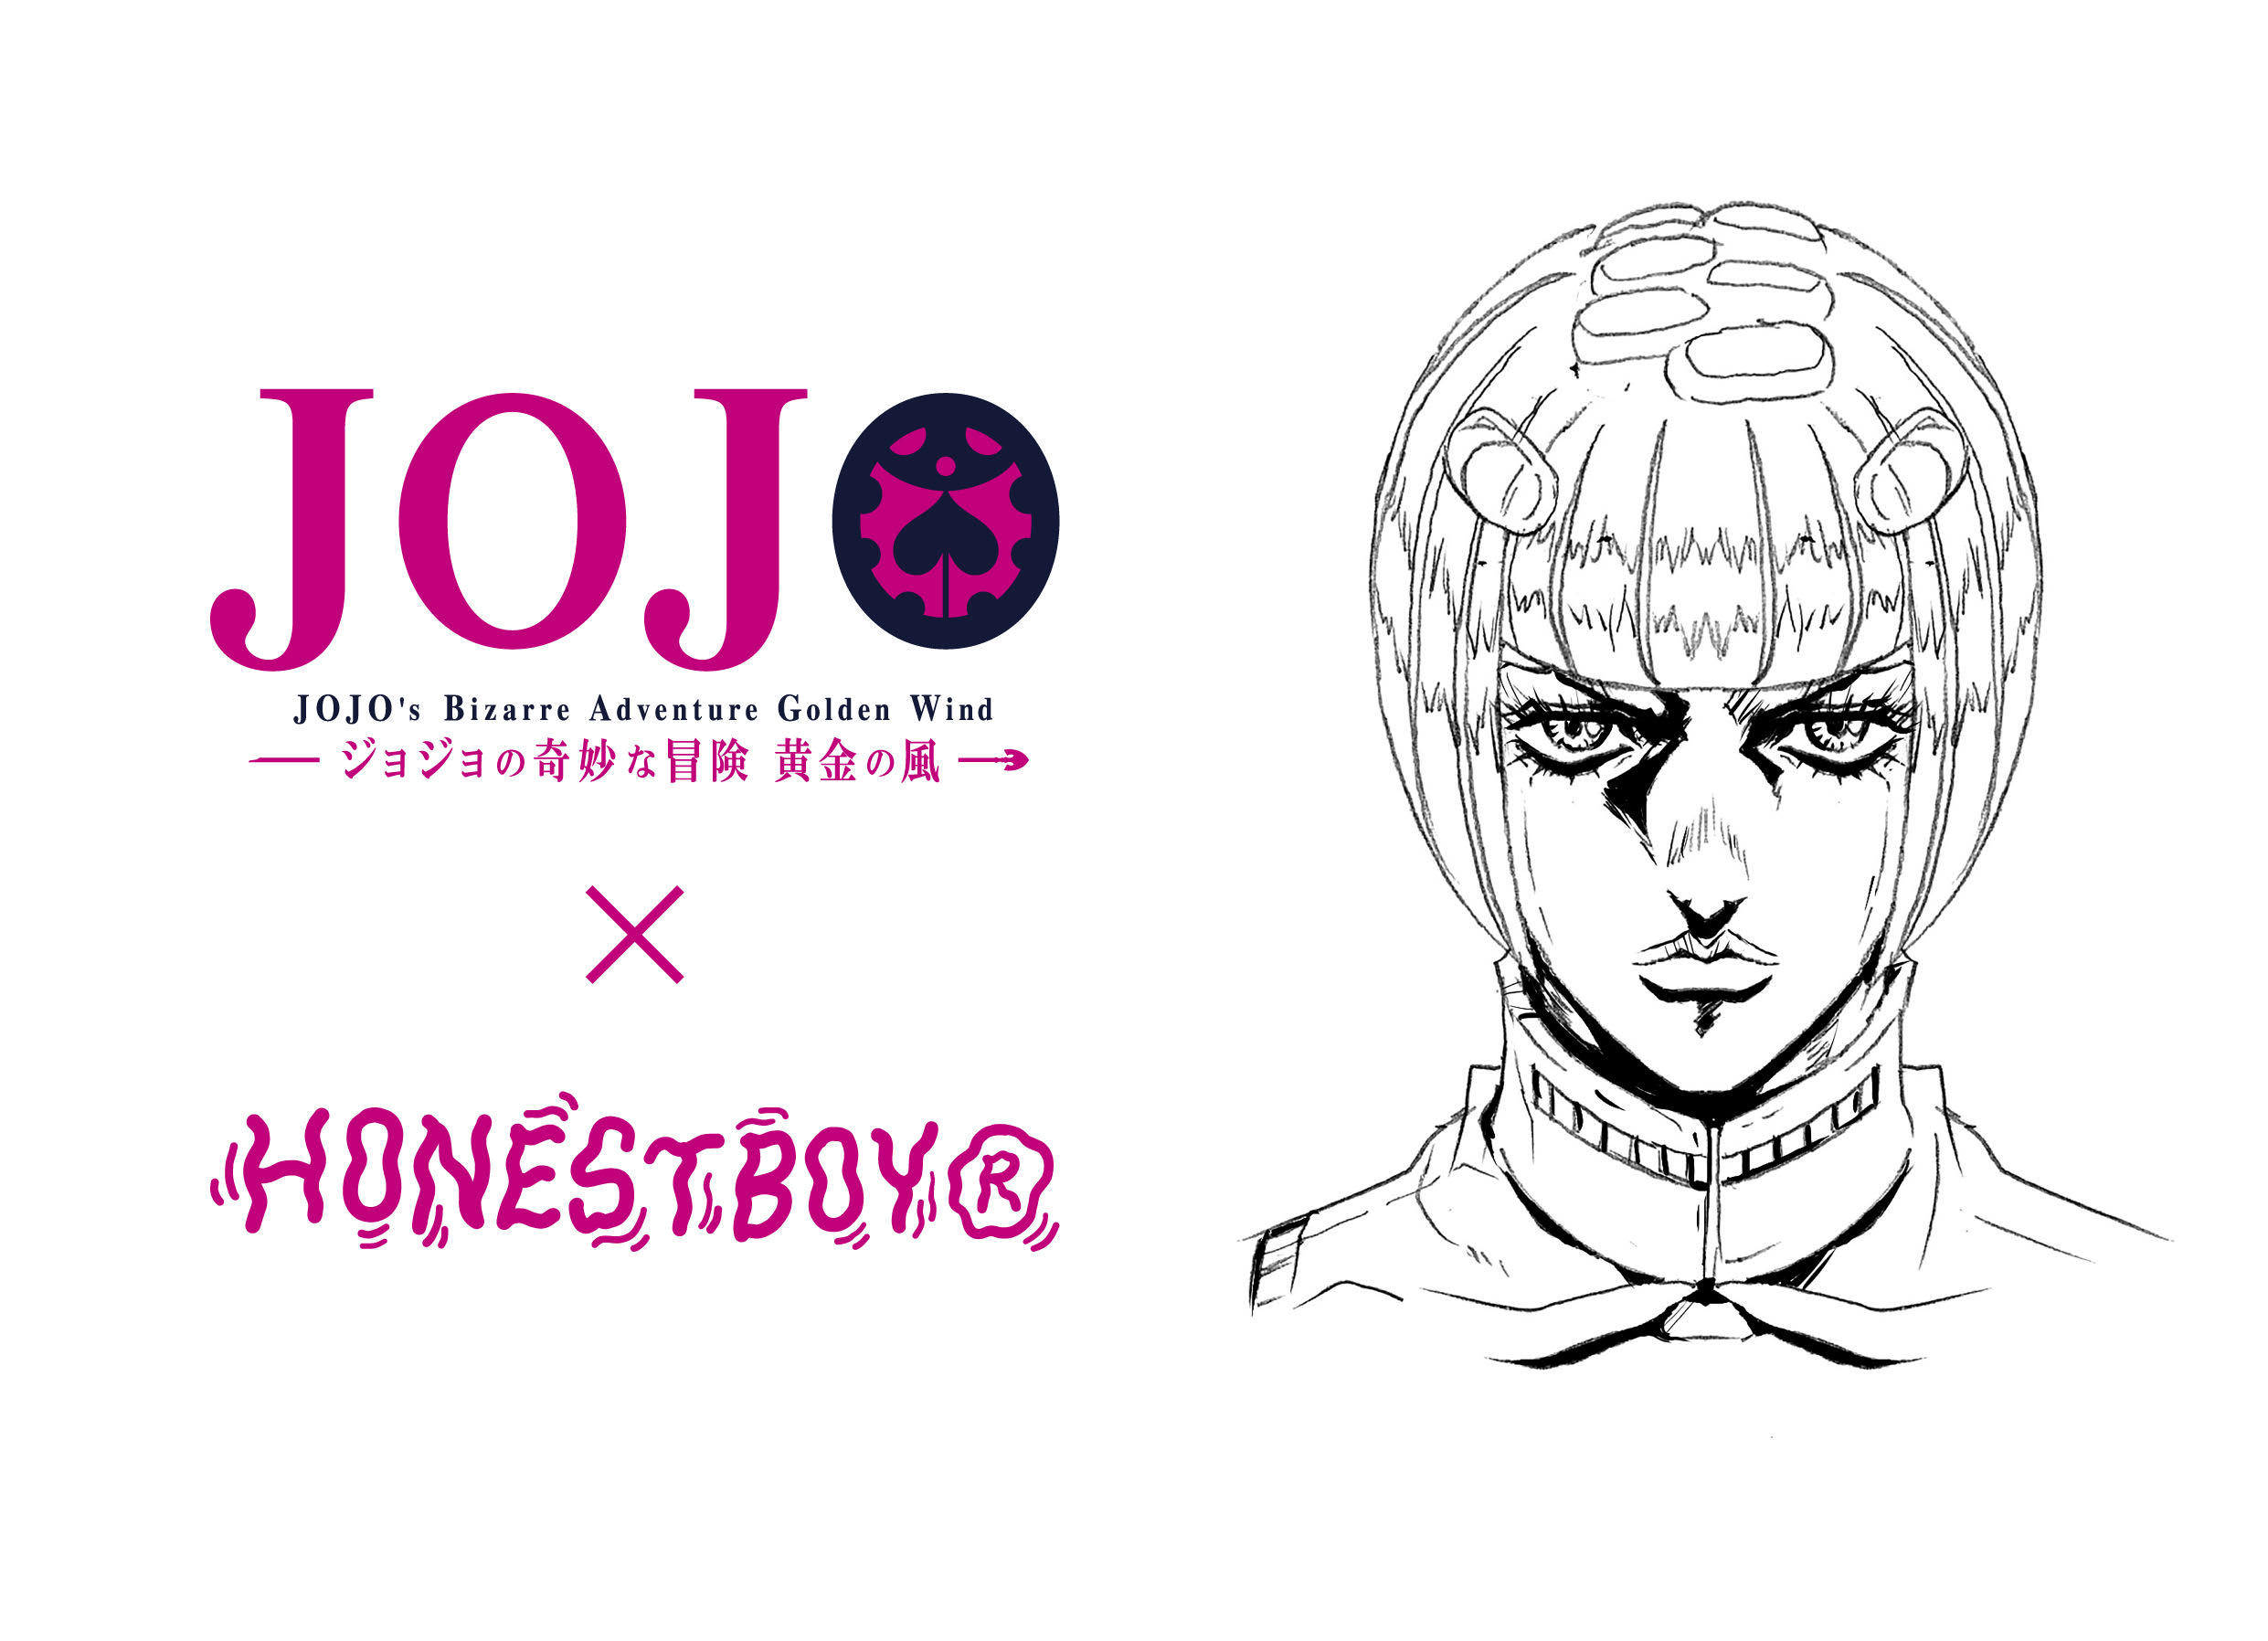 HONESTBOY®×アニメ「ジョジョ」<br>着想源はあのキャラクター